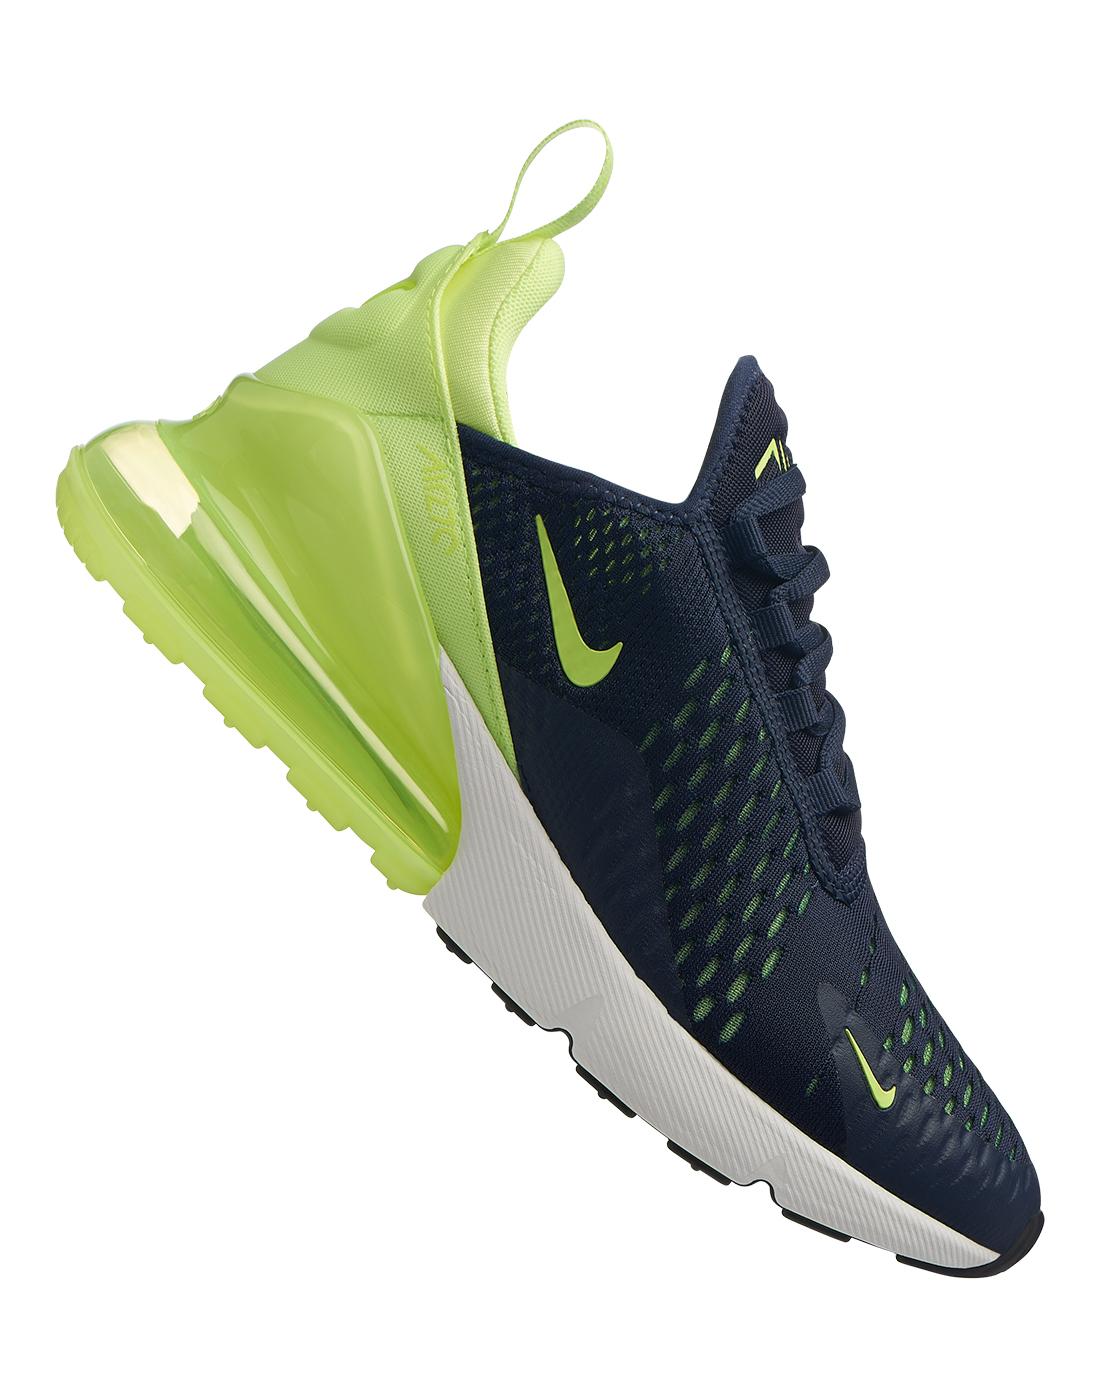 Women's Navy \u0026 Green Nike Air Max 270